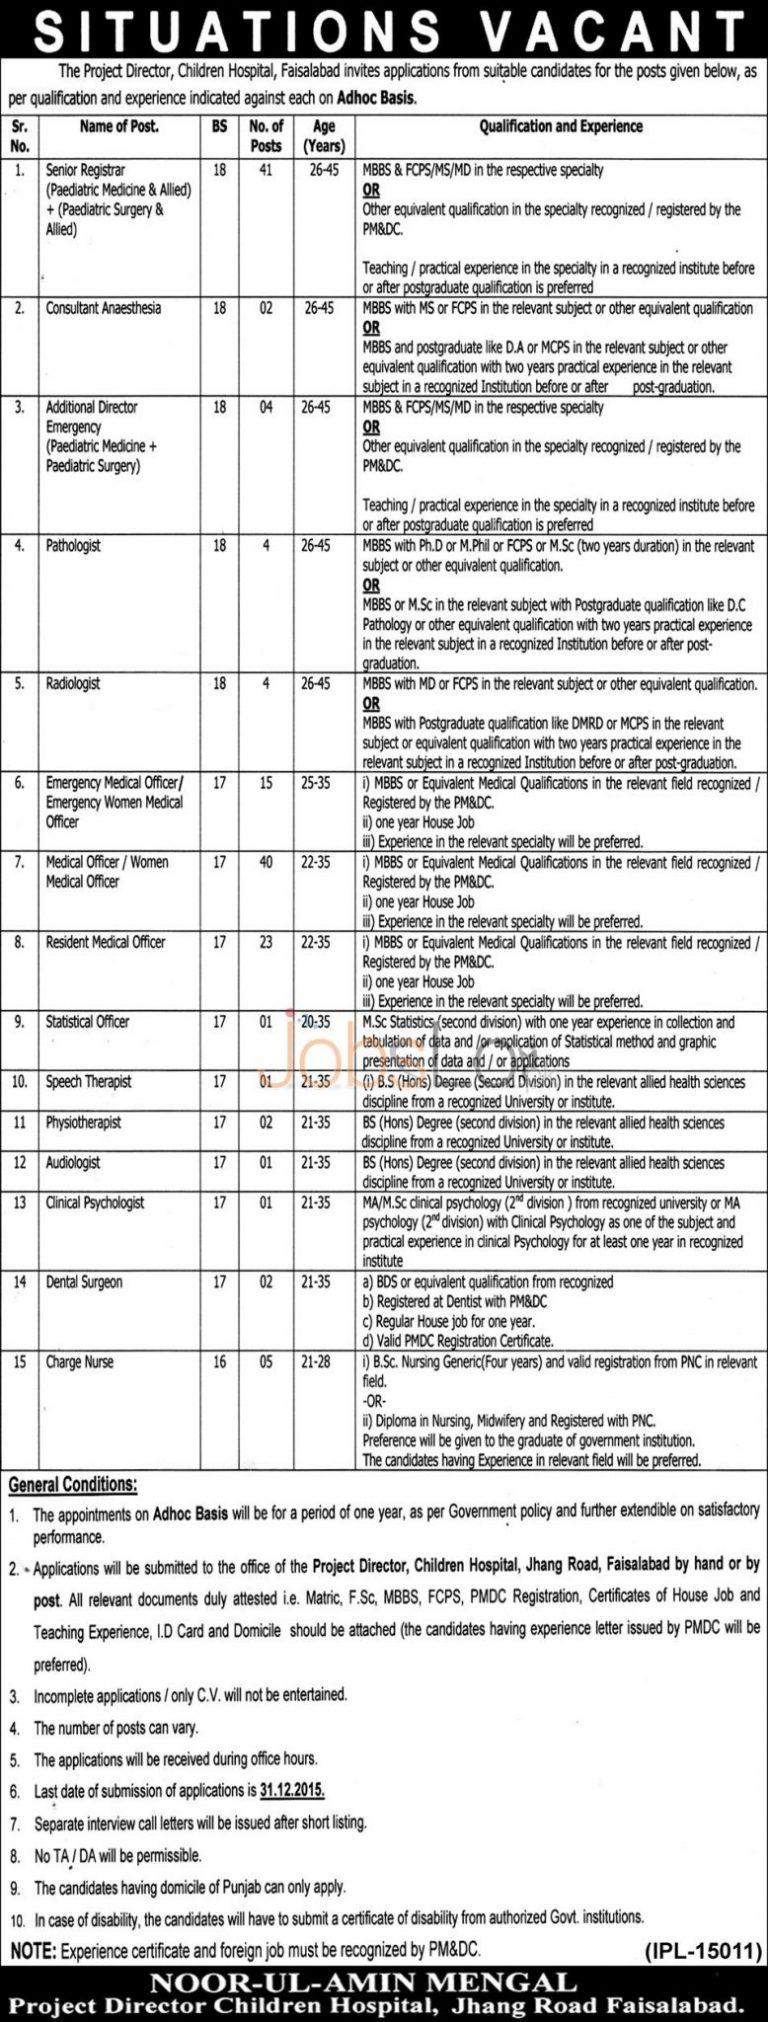 Government of Punjab Children's Hospital Faisalabad Jobs December 2015